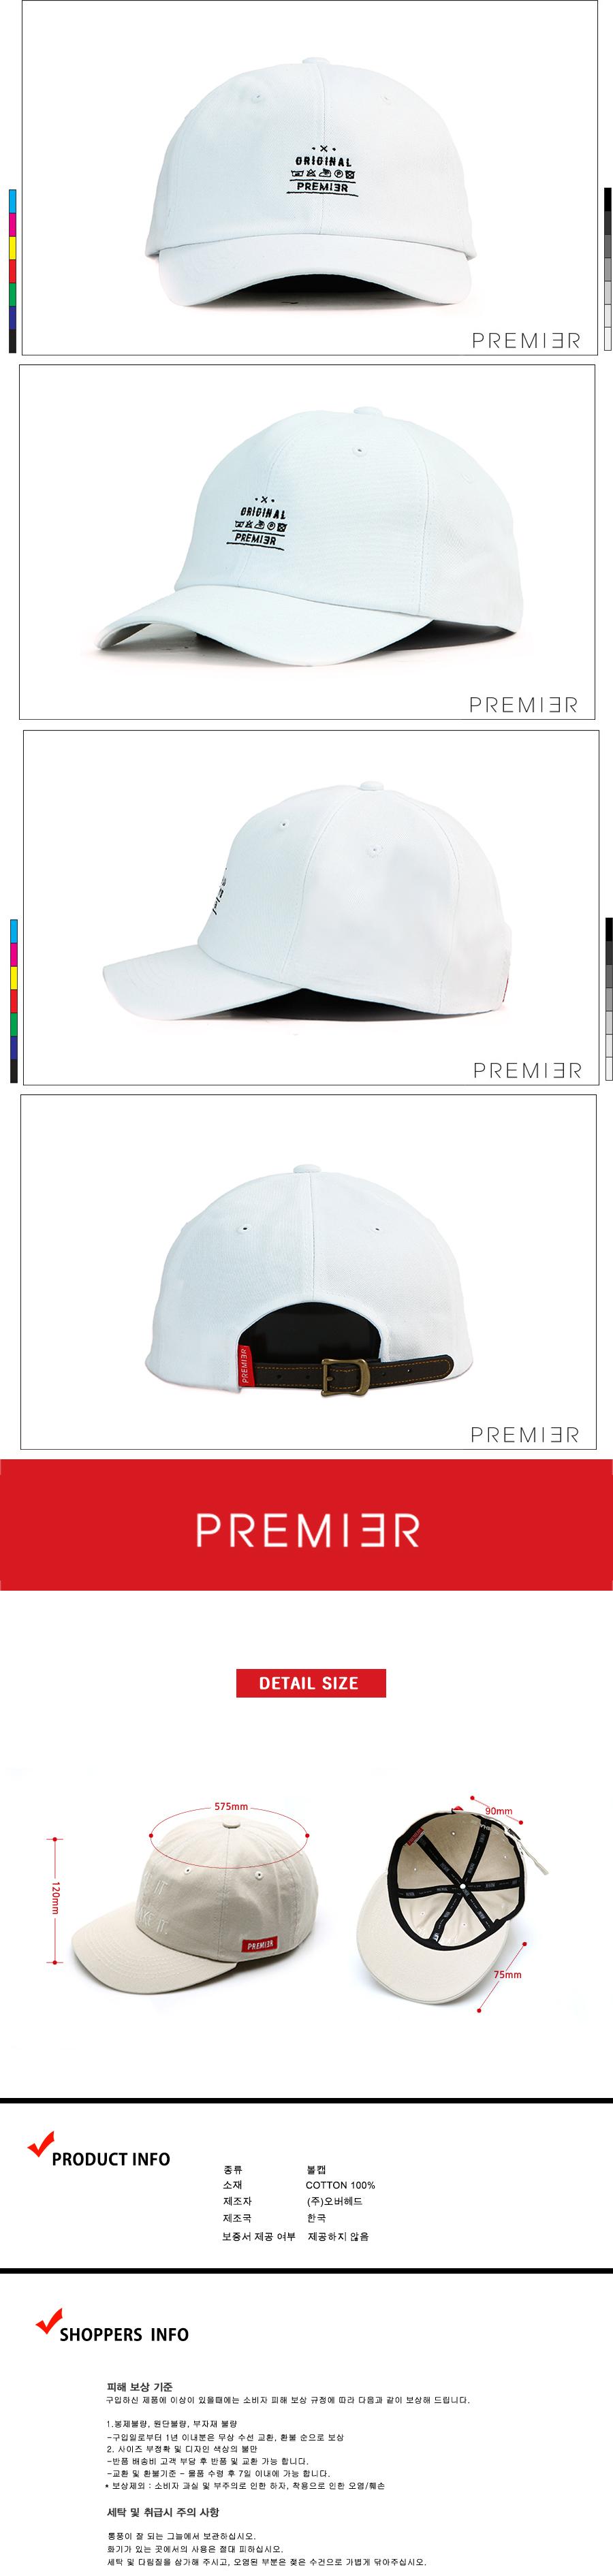 [ PREMIER ] [Premier] Ball Cap Original Premier White (P907)